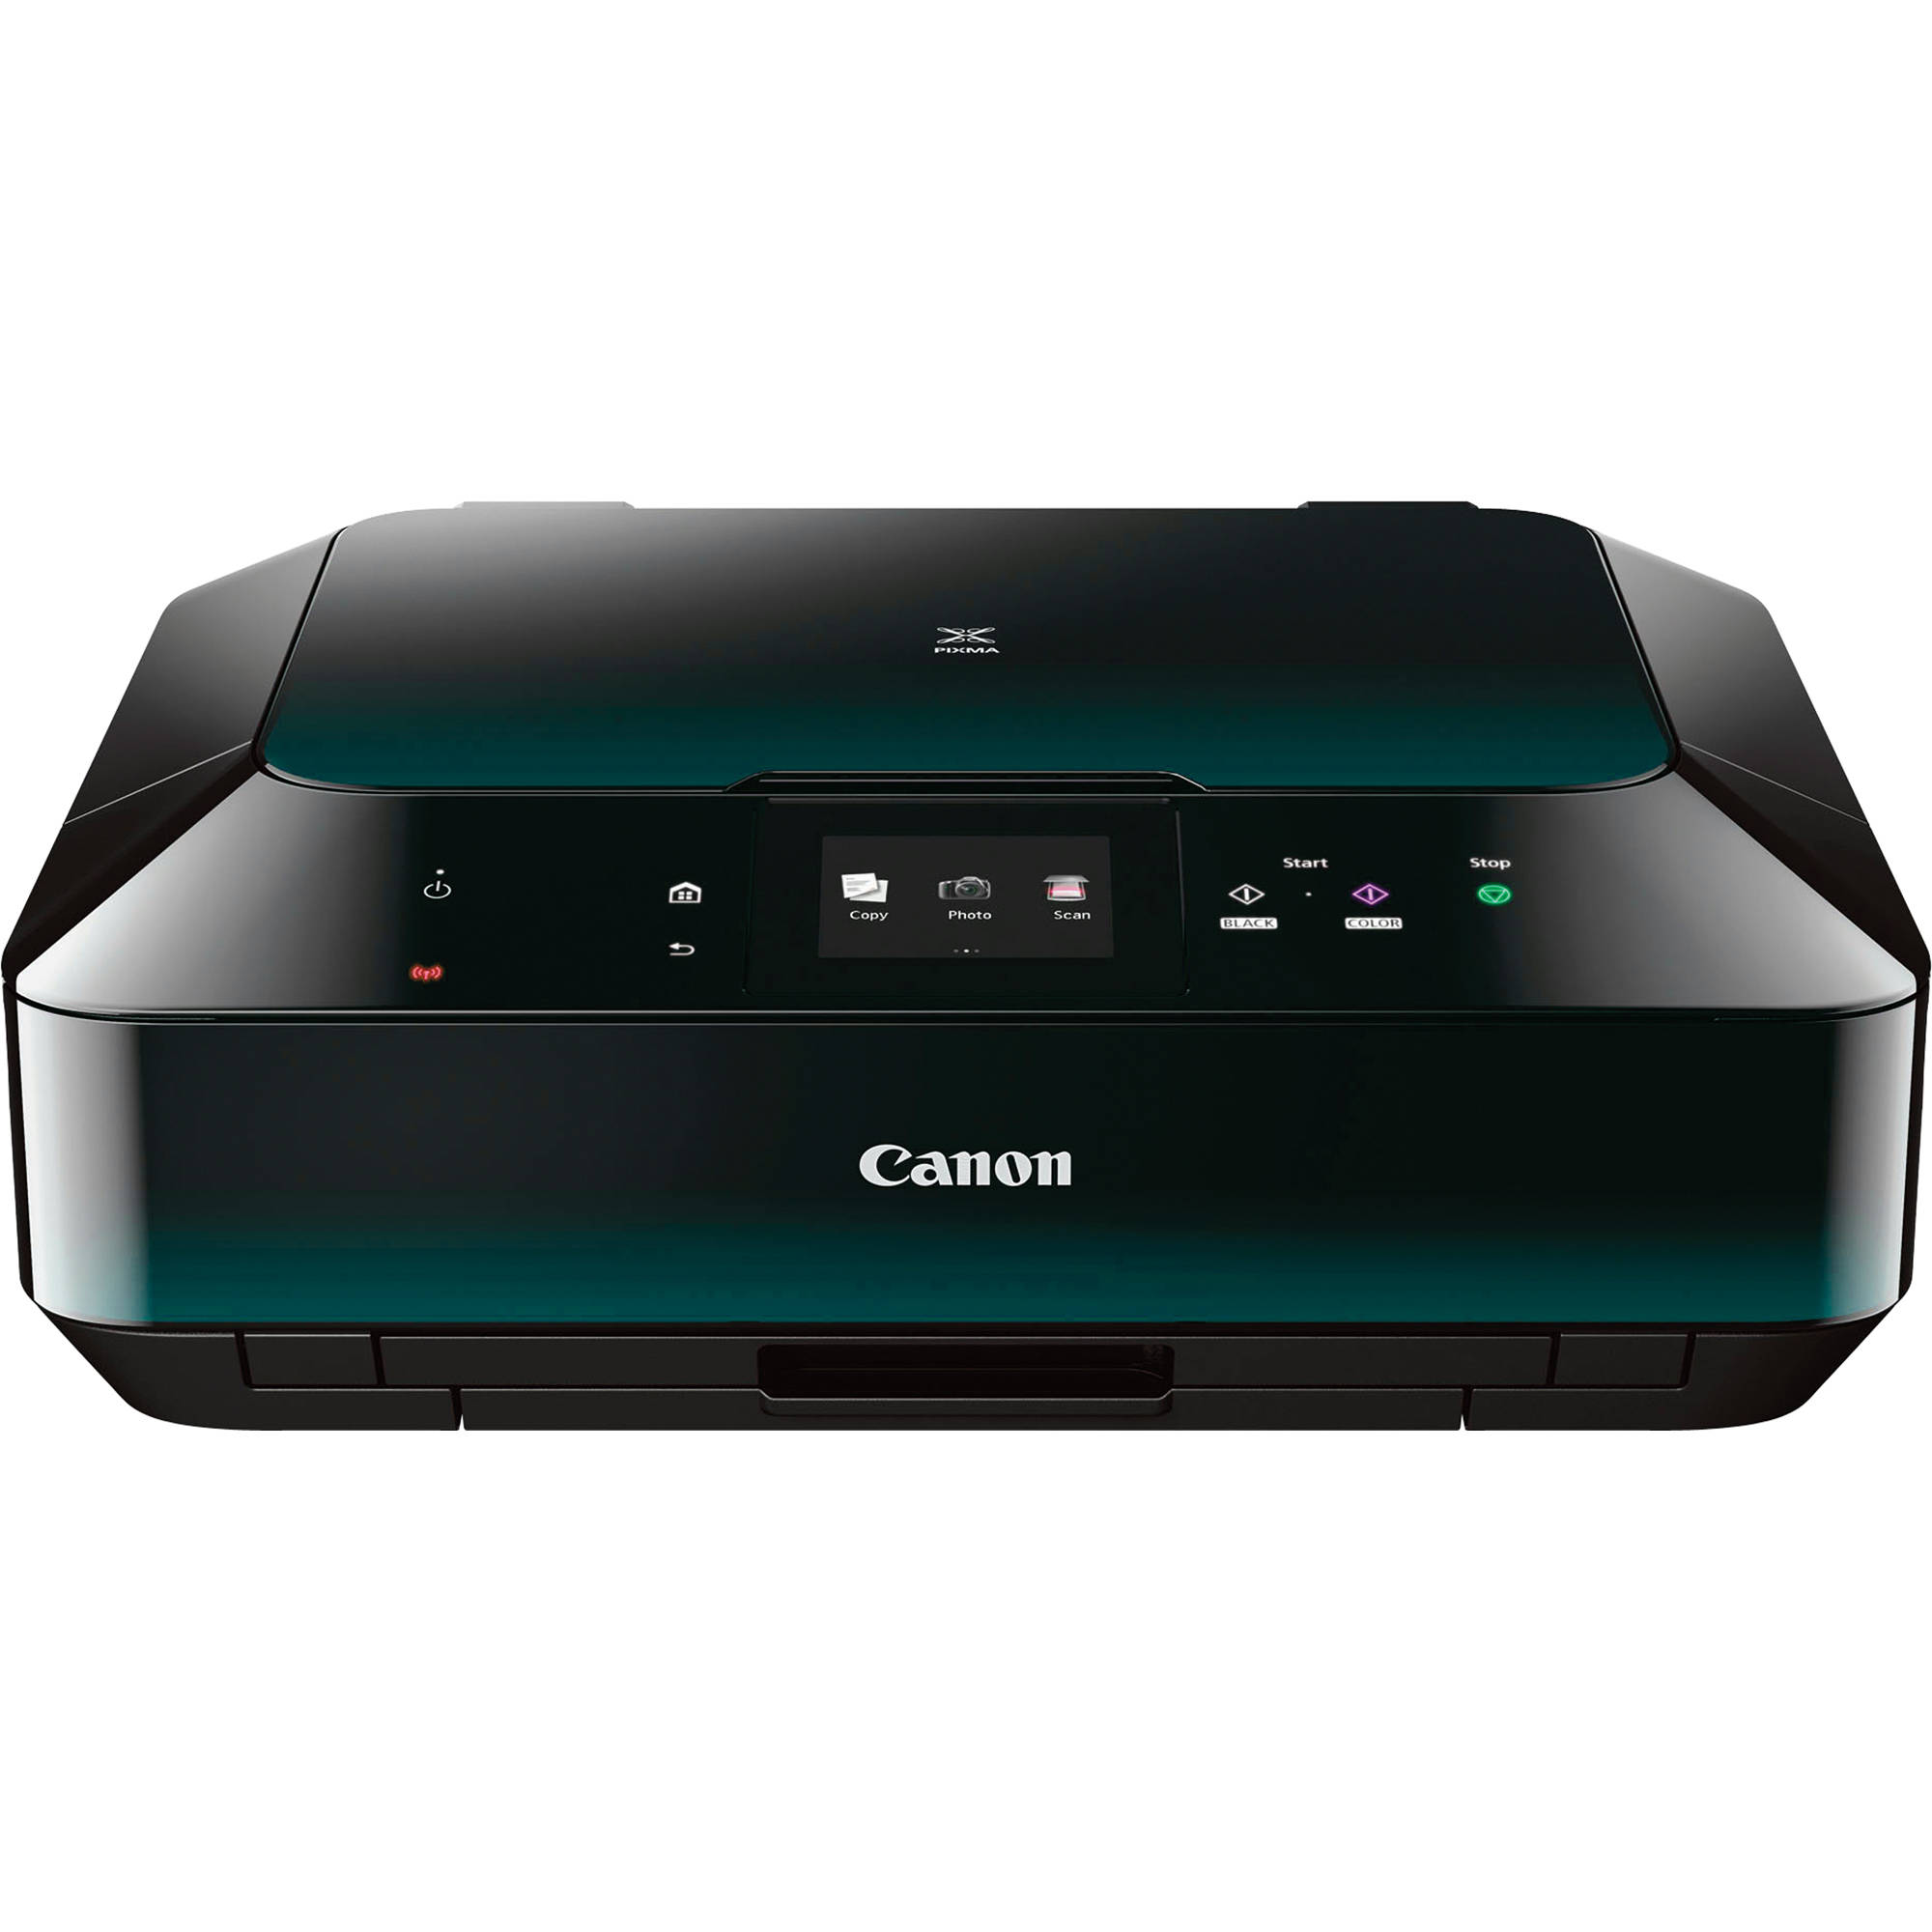 Color printer wireless - Canon Pixma Mg6320 Wireless Color All In One Inkjet Photo Printer Blue